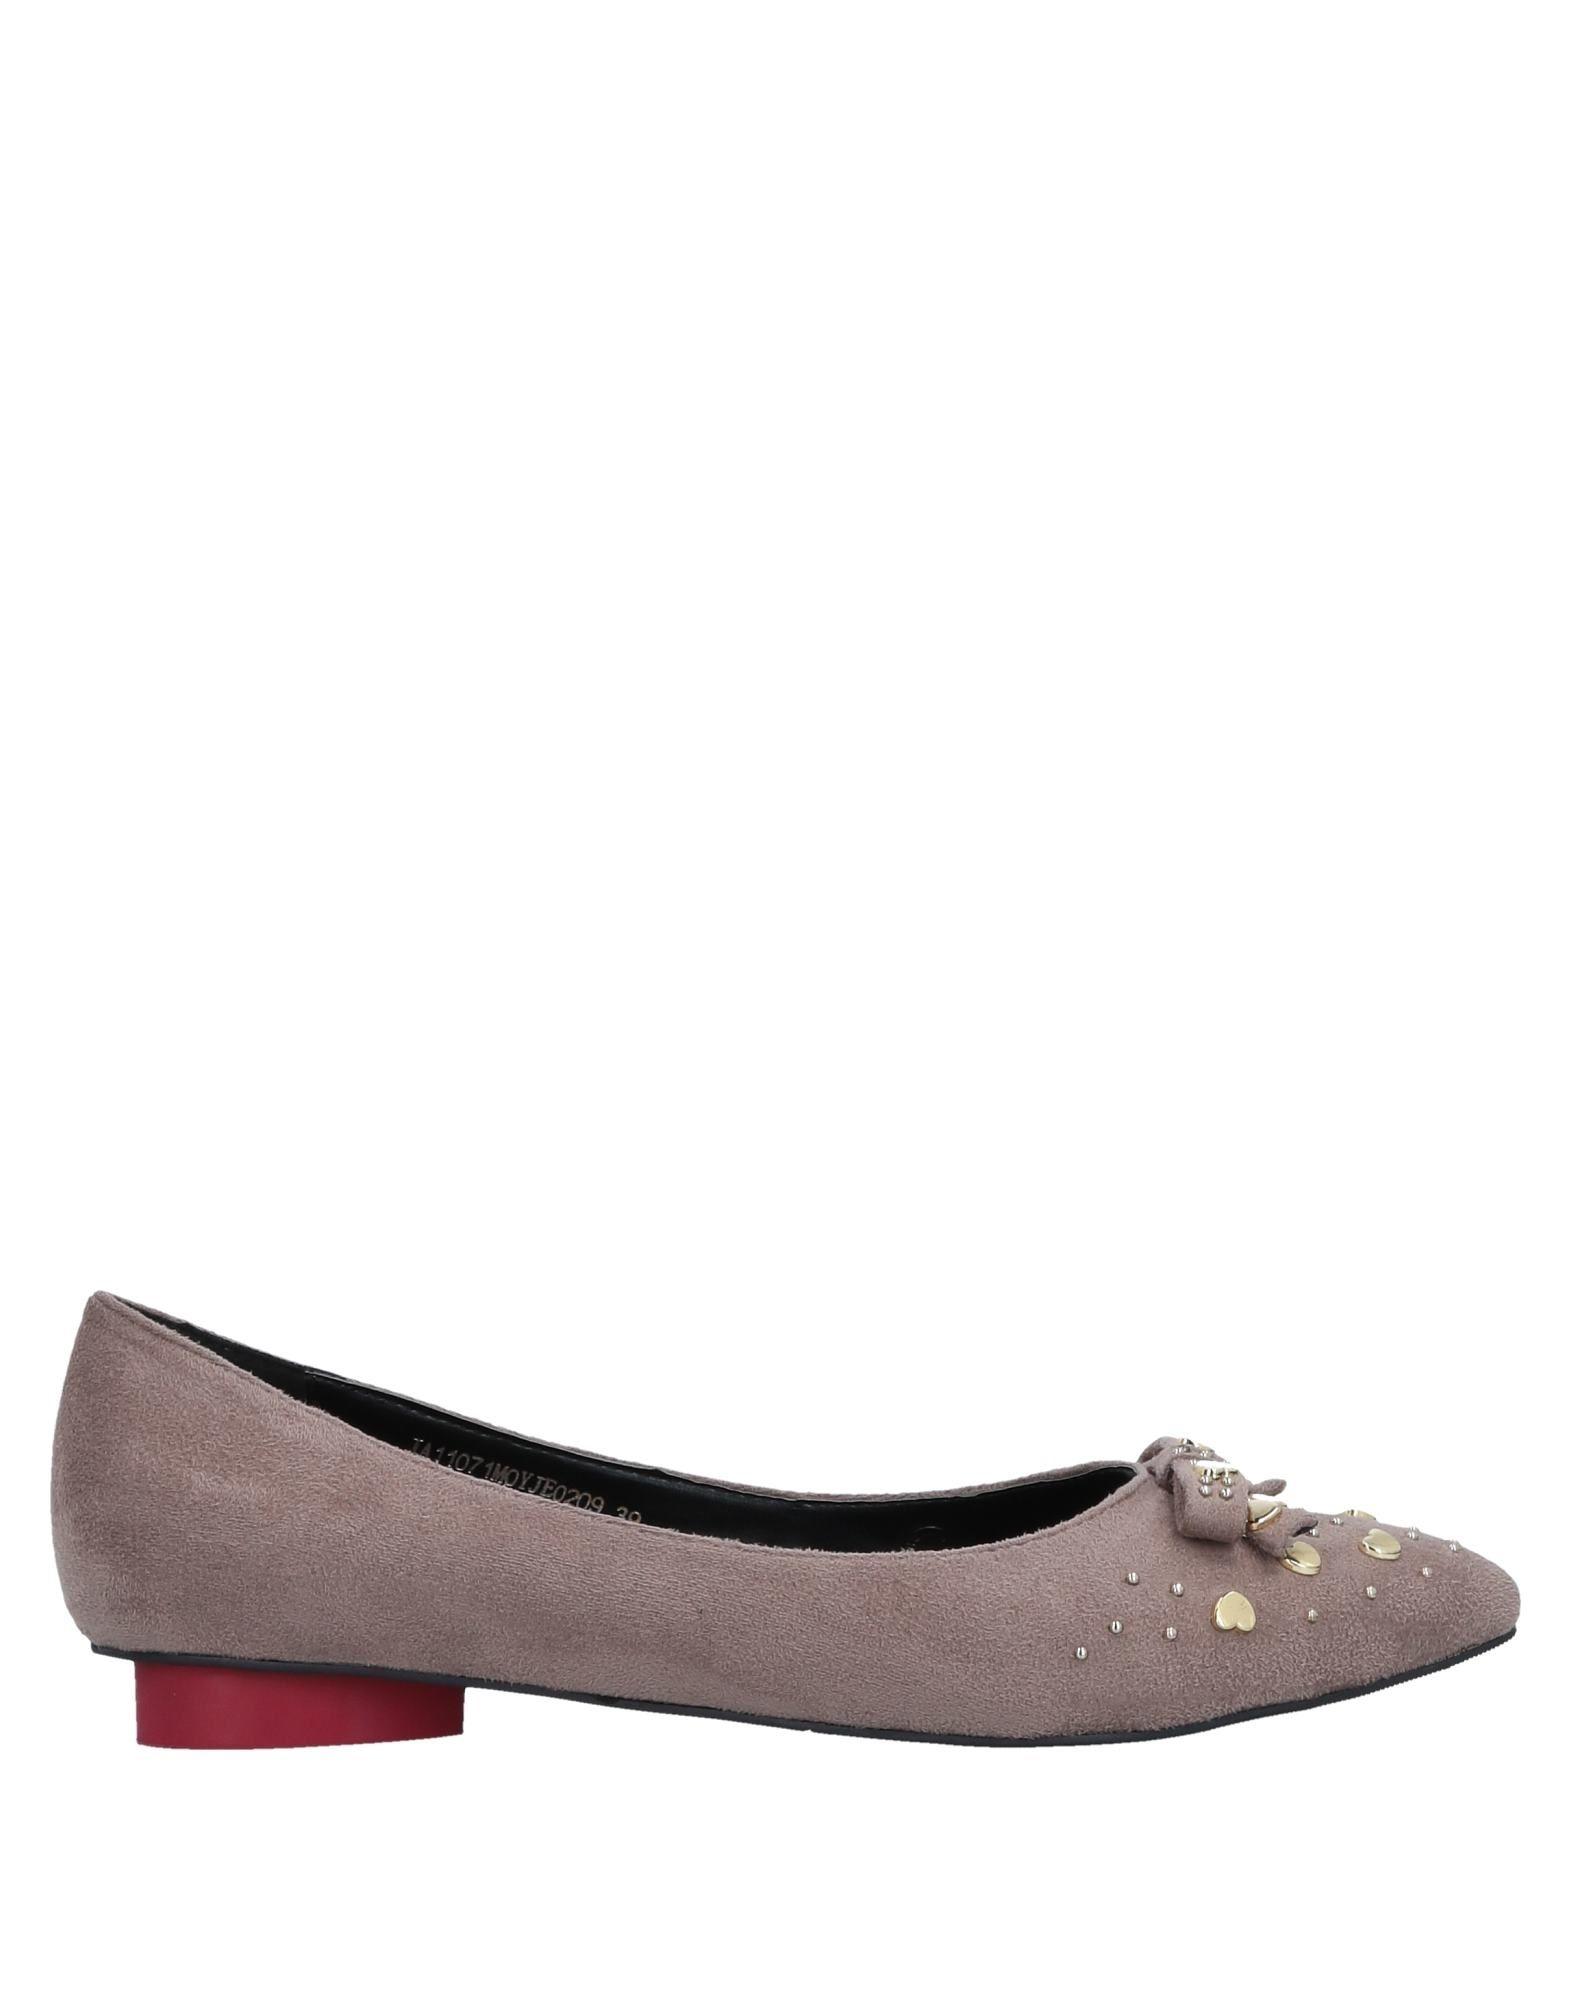 Love Moschino  Ballerinas Damen  Moschino 11527293KX Neue Schuhe 960f1d